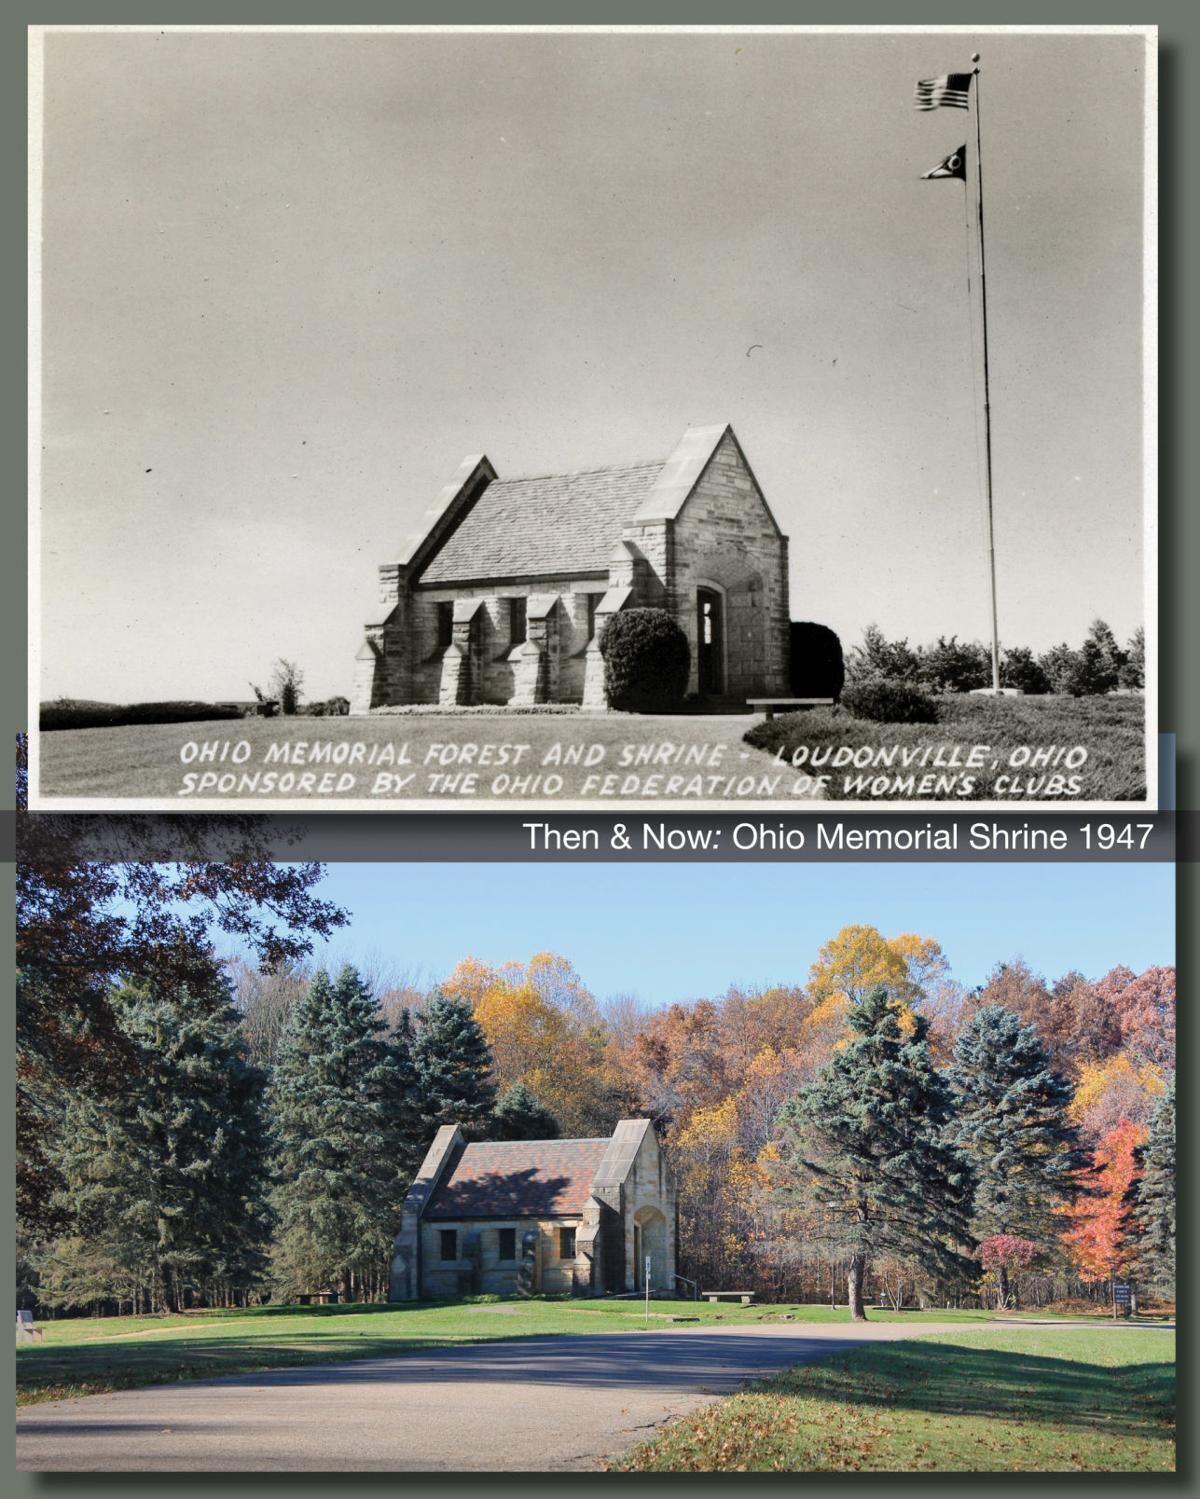 Mohican-Memorial Shrine 1947